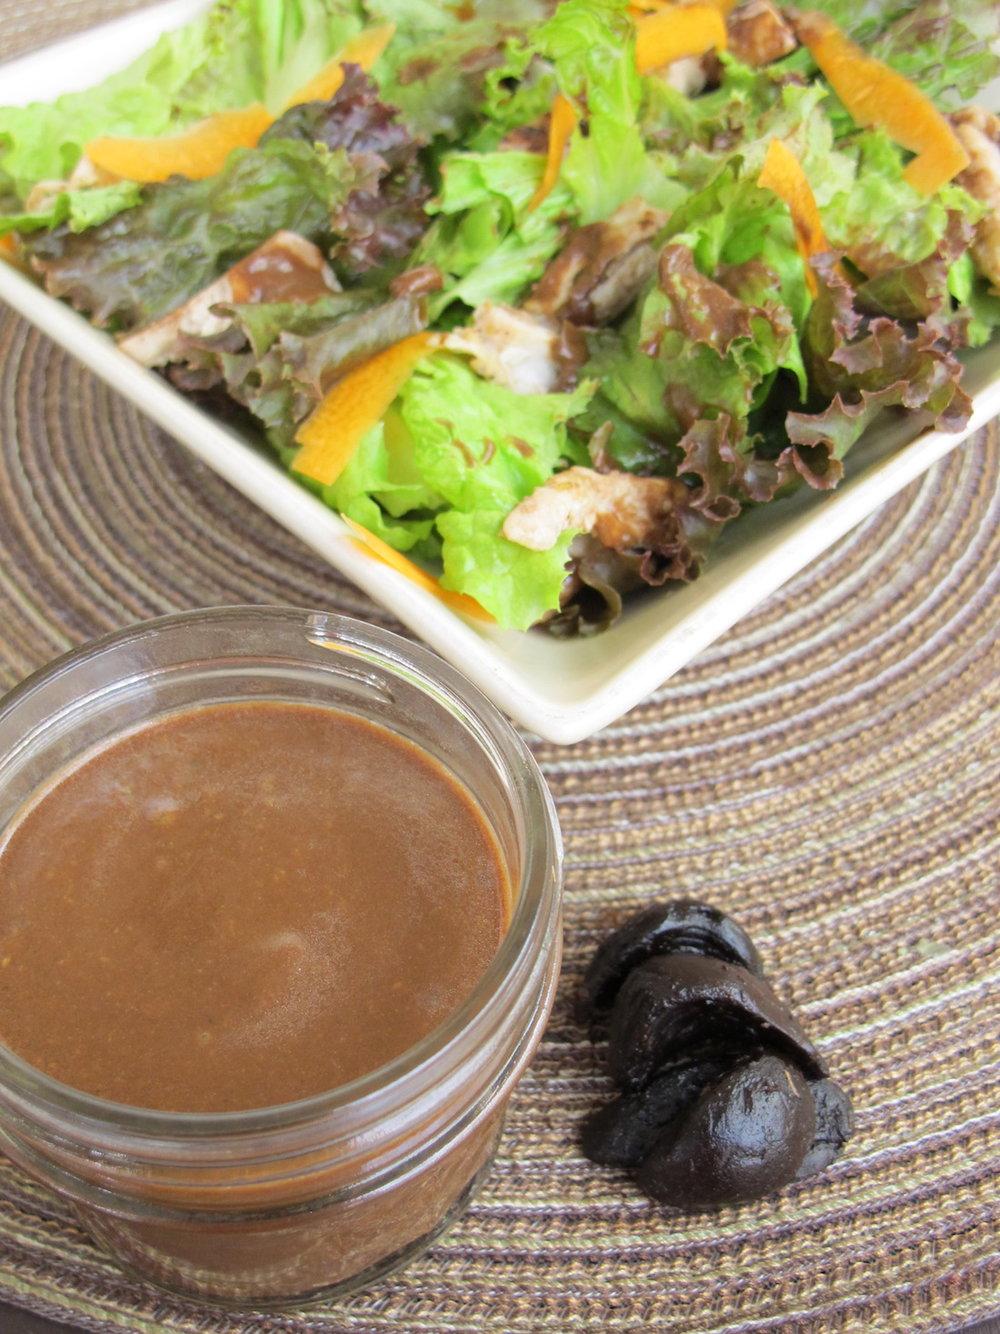 Black Garlic sauce and salad